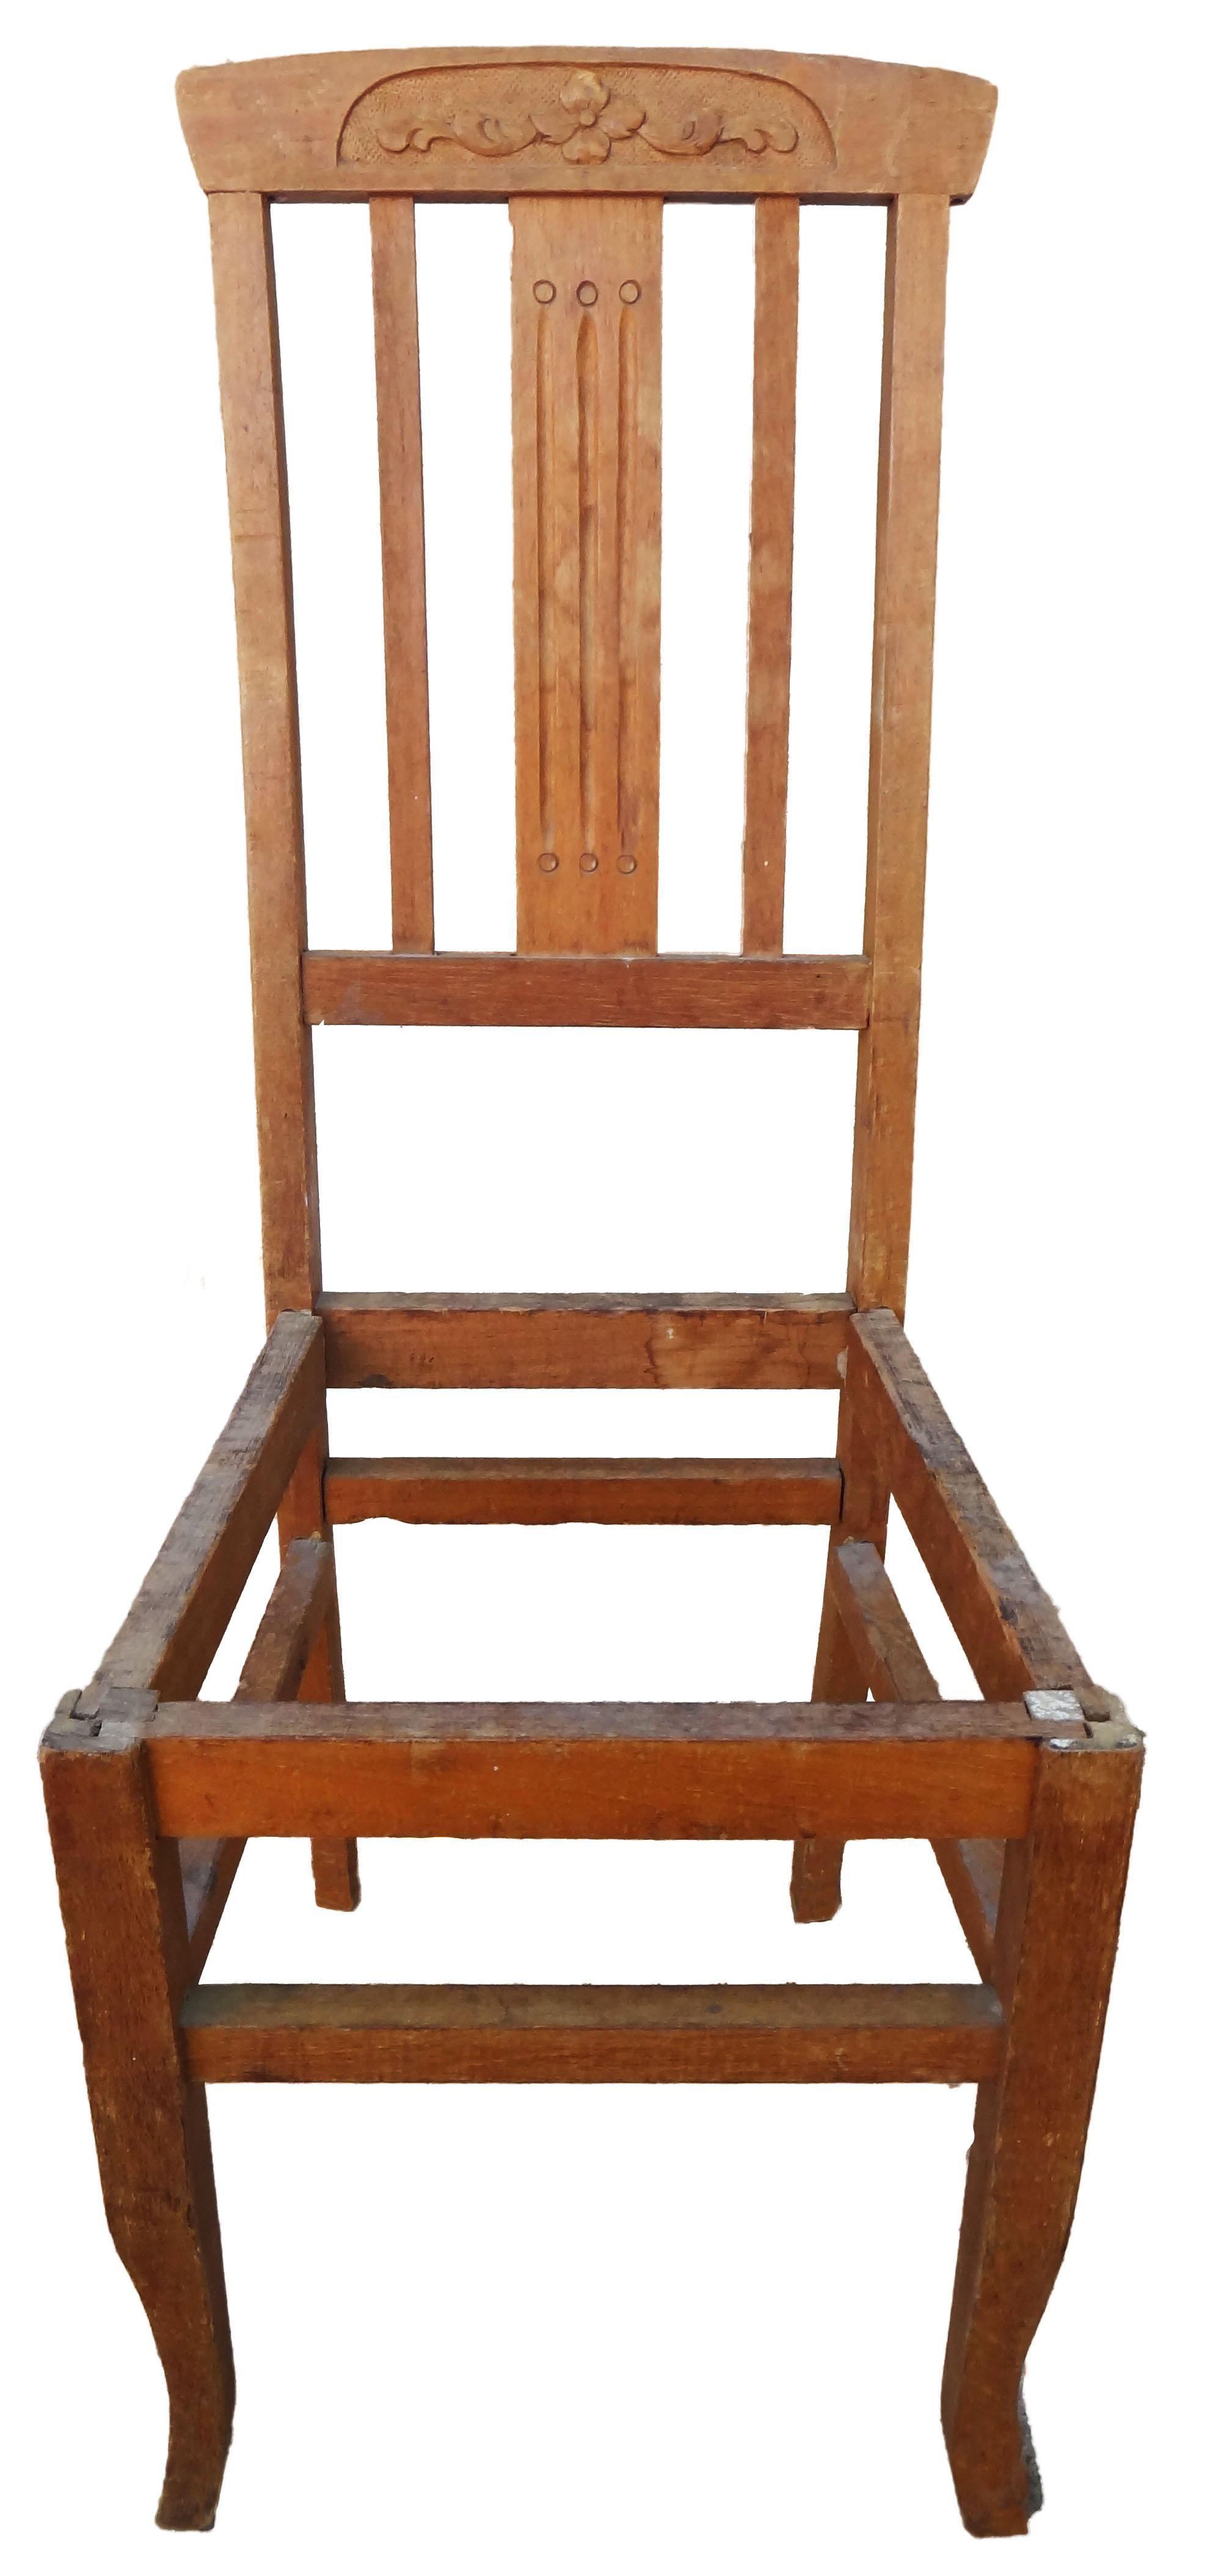 Modelos sillas conjunto comedor mesa sillas modelo nicole for Modelos de sillas de madera